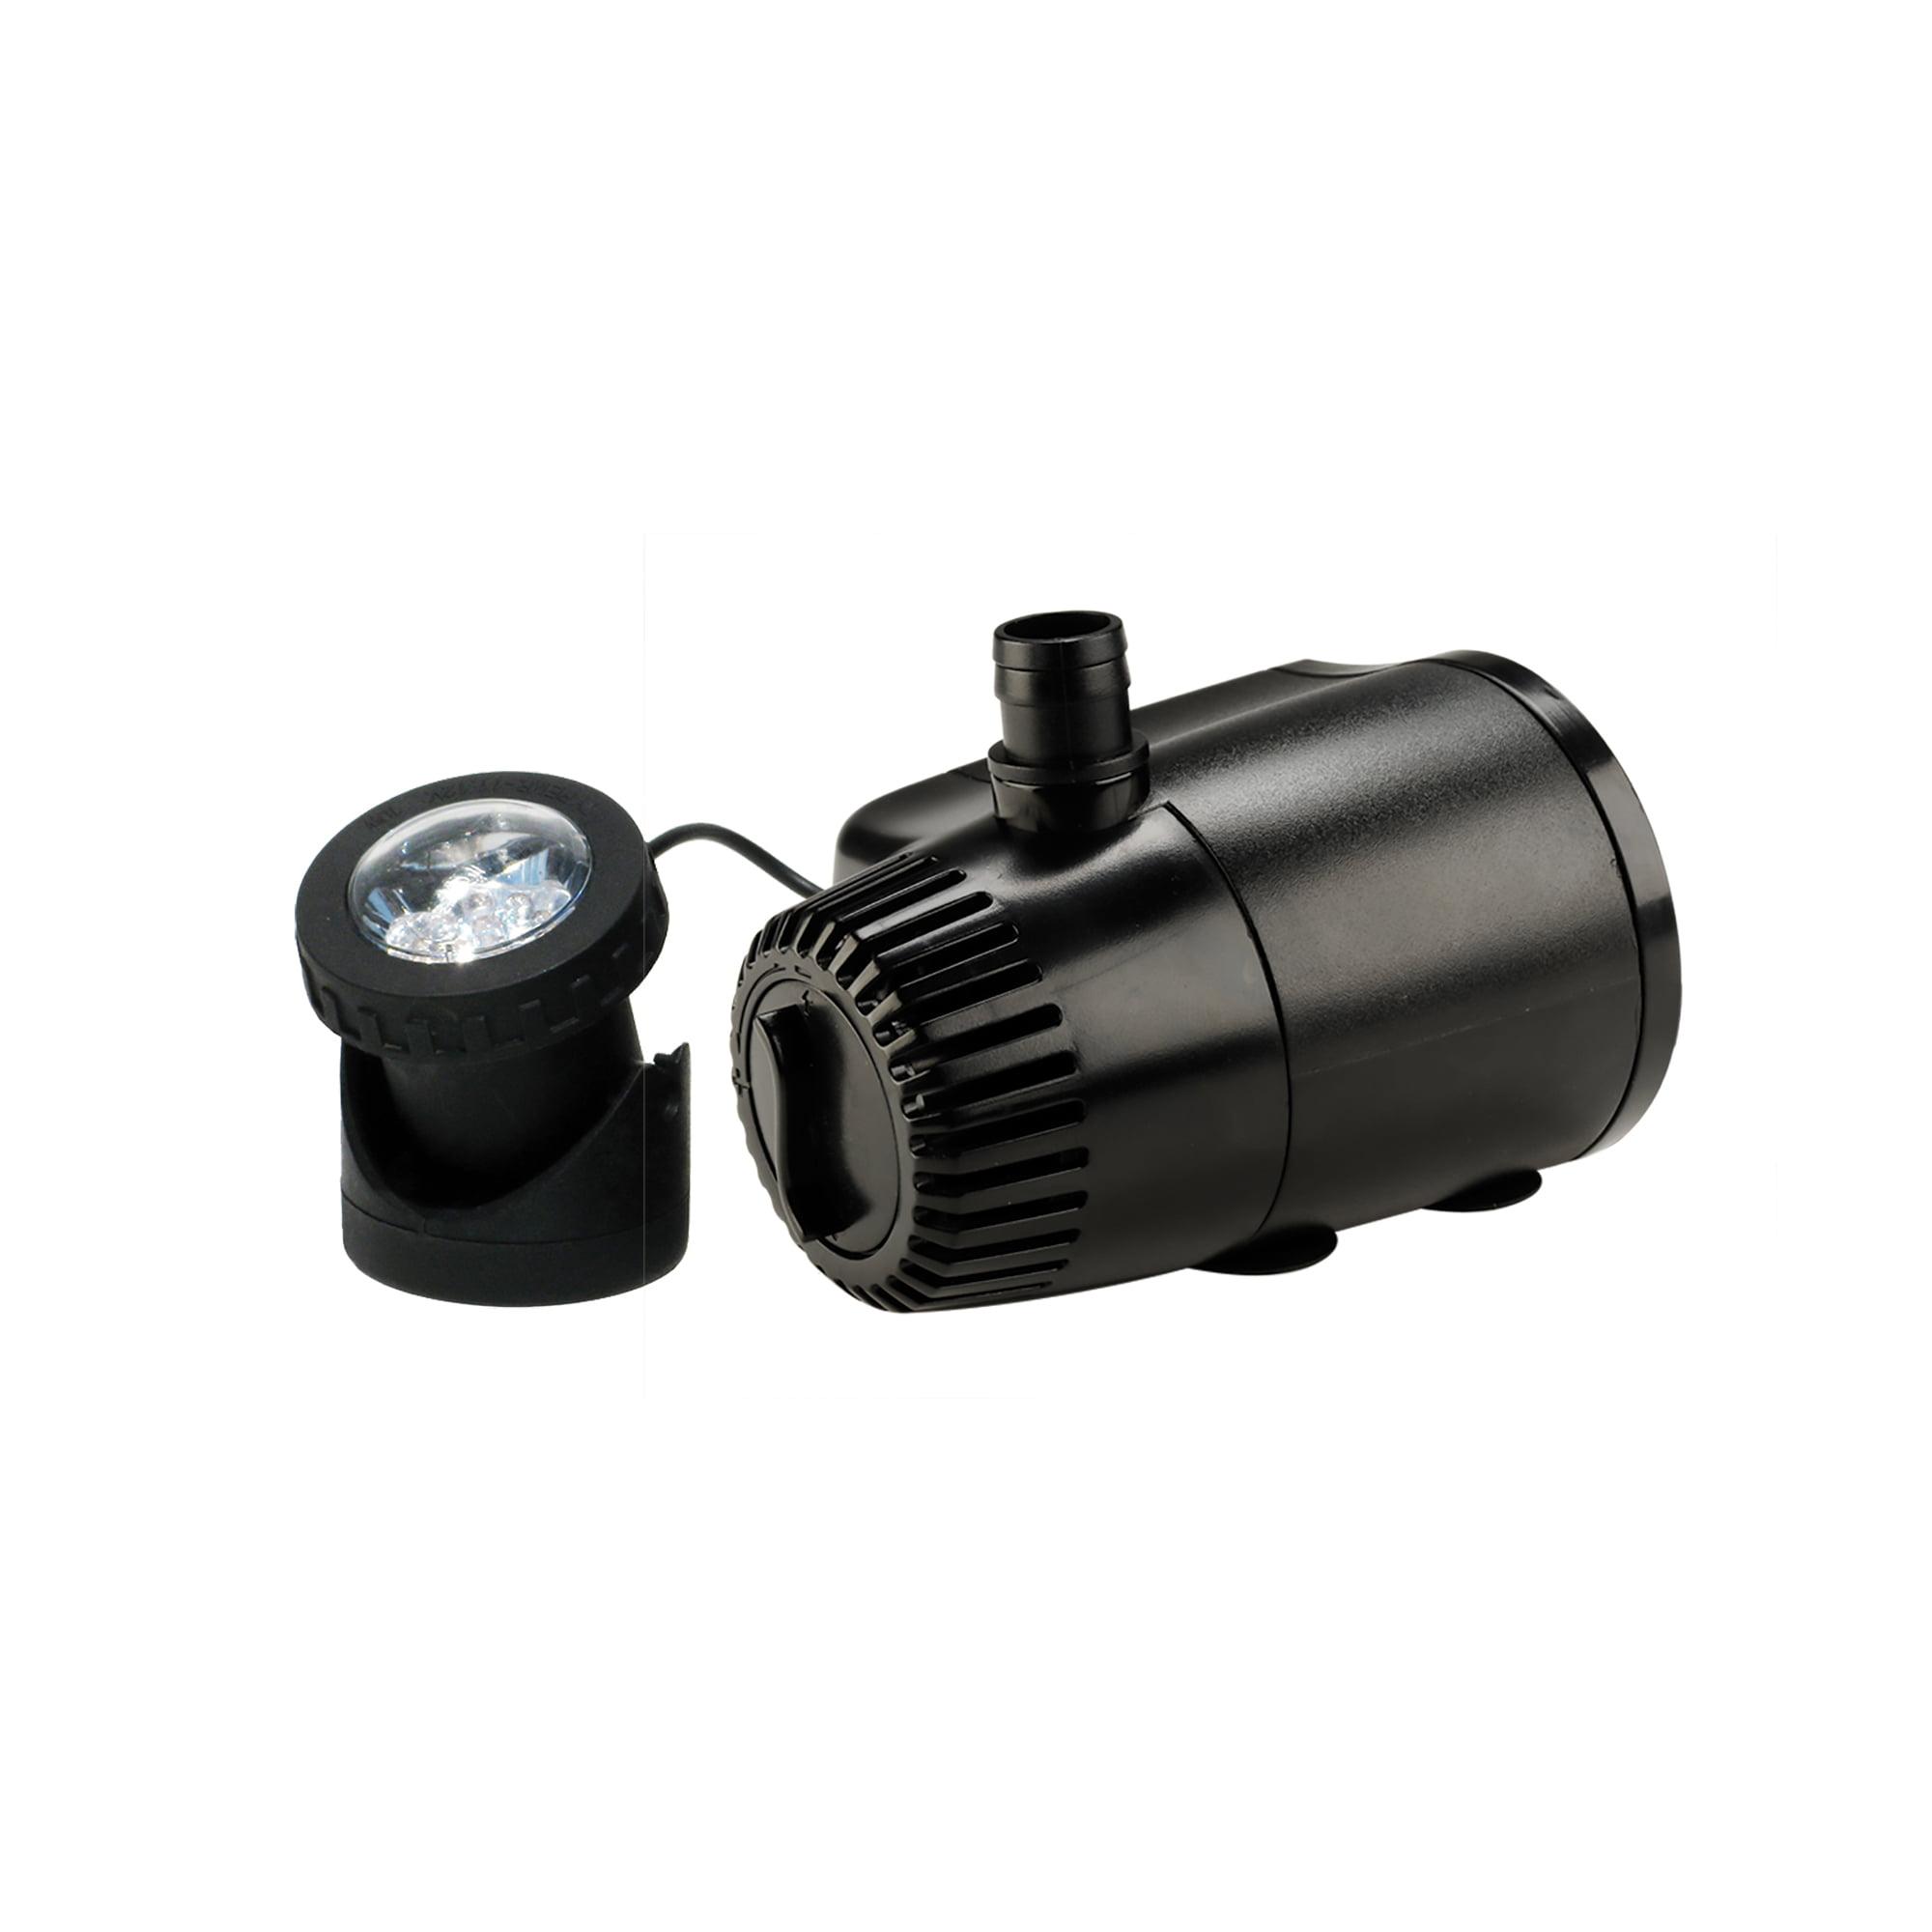 419 GPH Auto Shut-off Fountain Pump plus Light